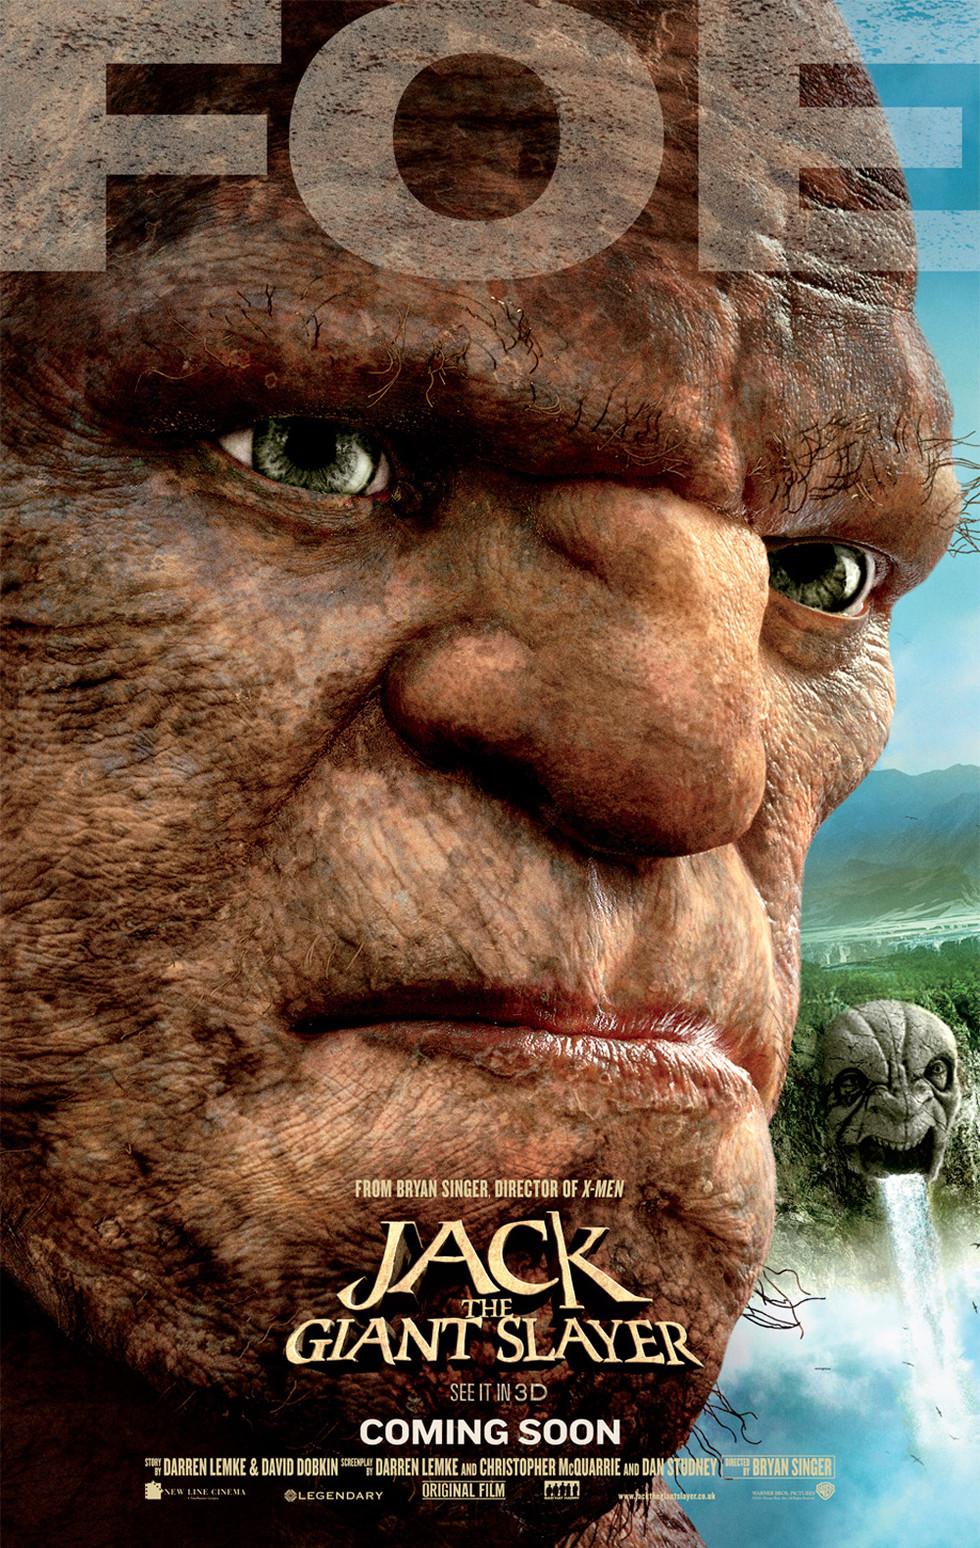 Jack the Giant Slayer - Movie Poster #5 (Large)